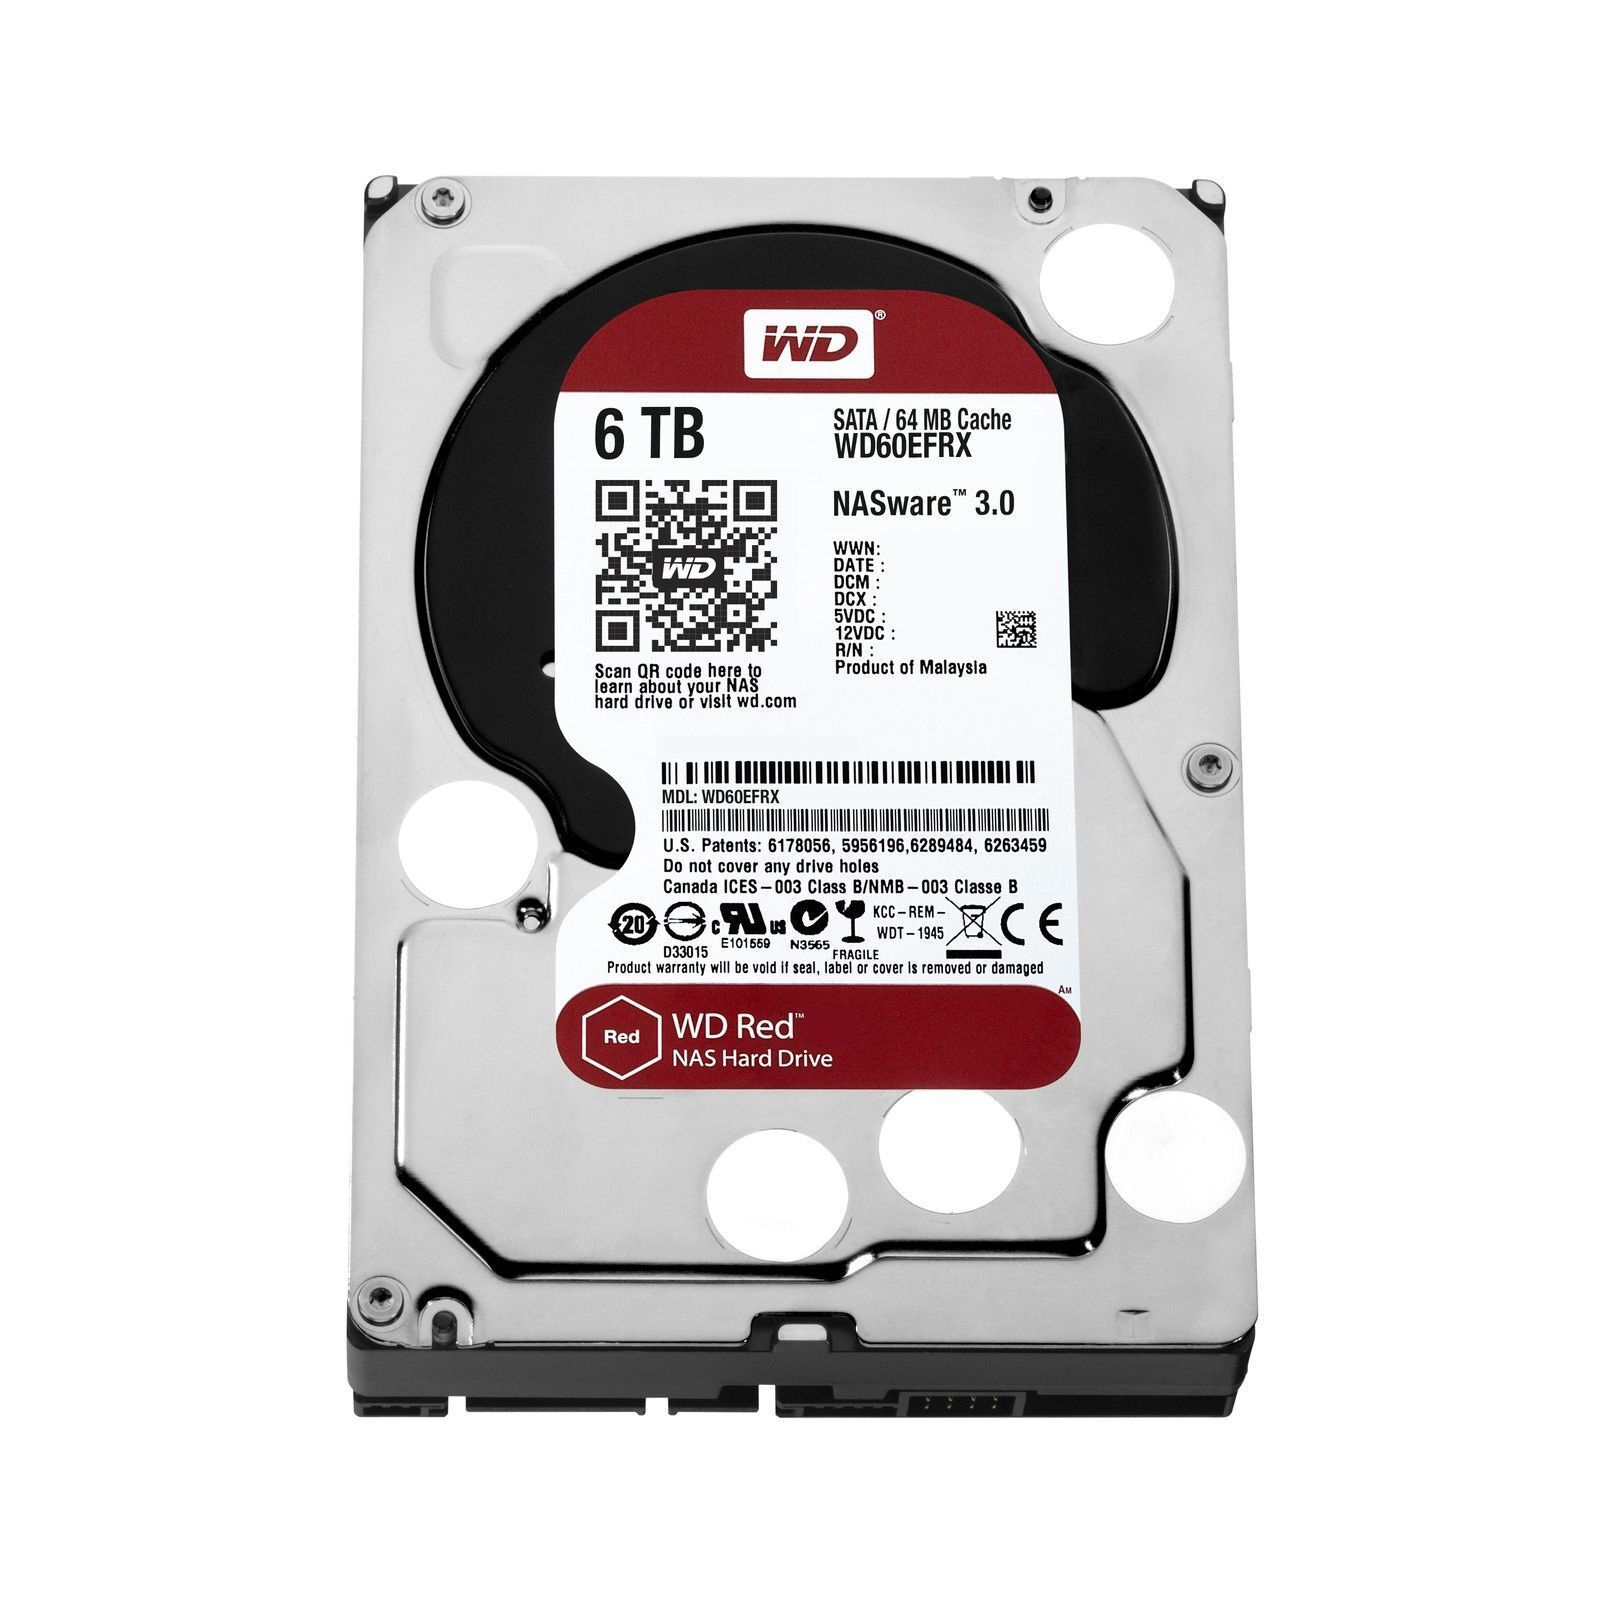 WD Red 6TB NAS HDD 5400RPM SATA 64MB IntelliPower Internal Hard Drive WD60EFRX